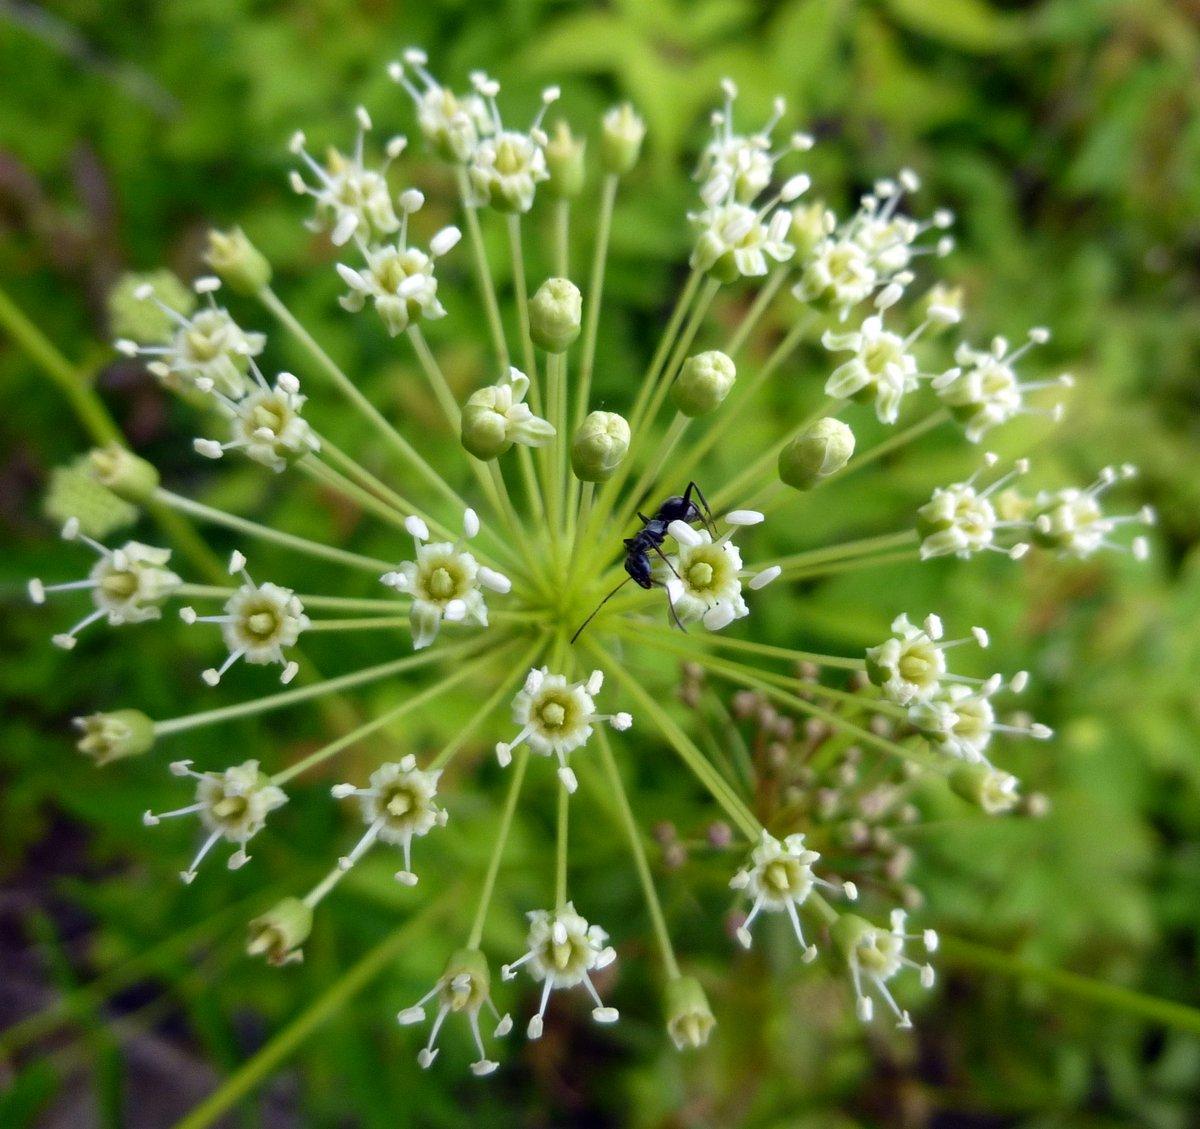 10. Bristly Sarsaparilla Flower Head